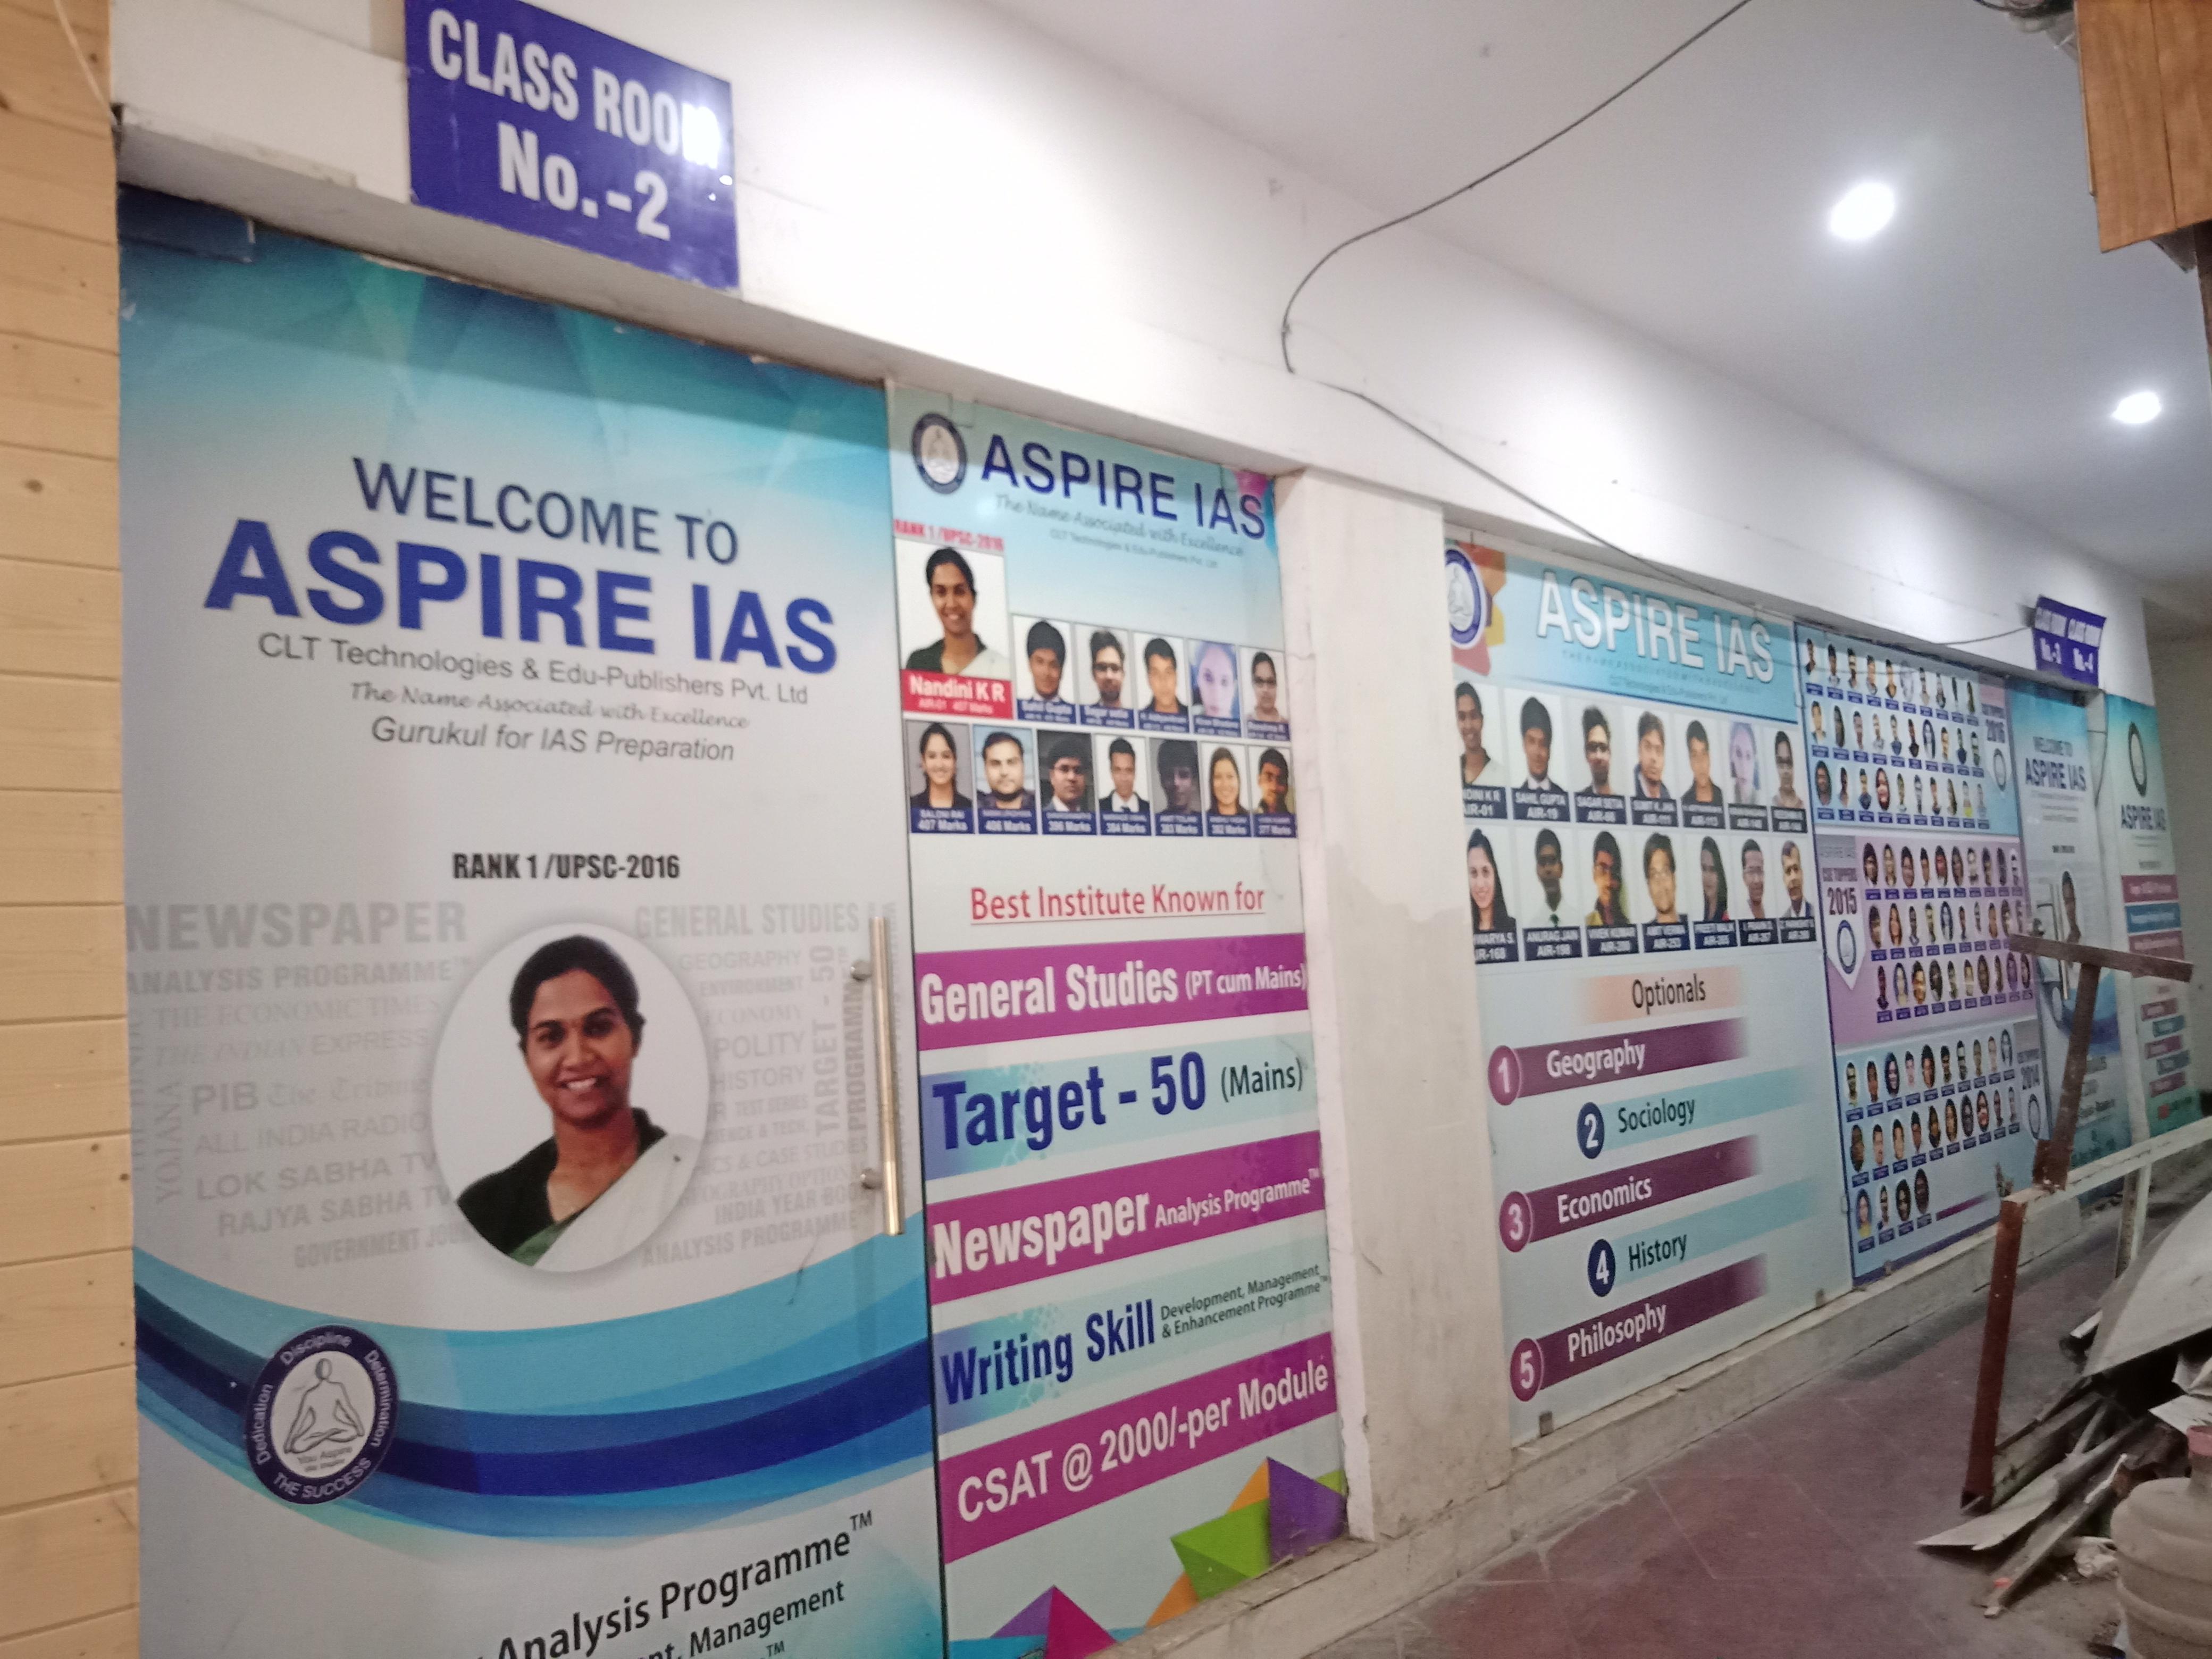 Aspire IAS Gallery